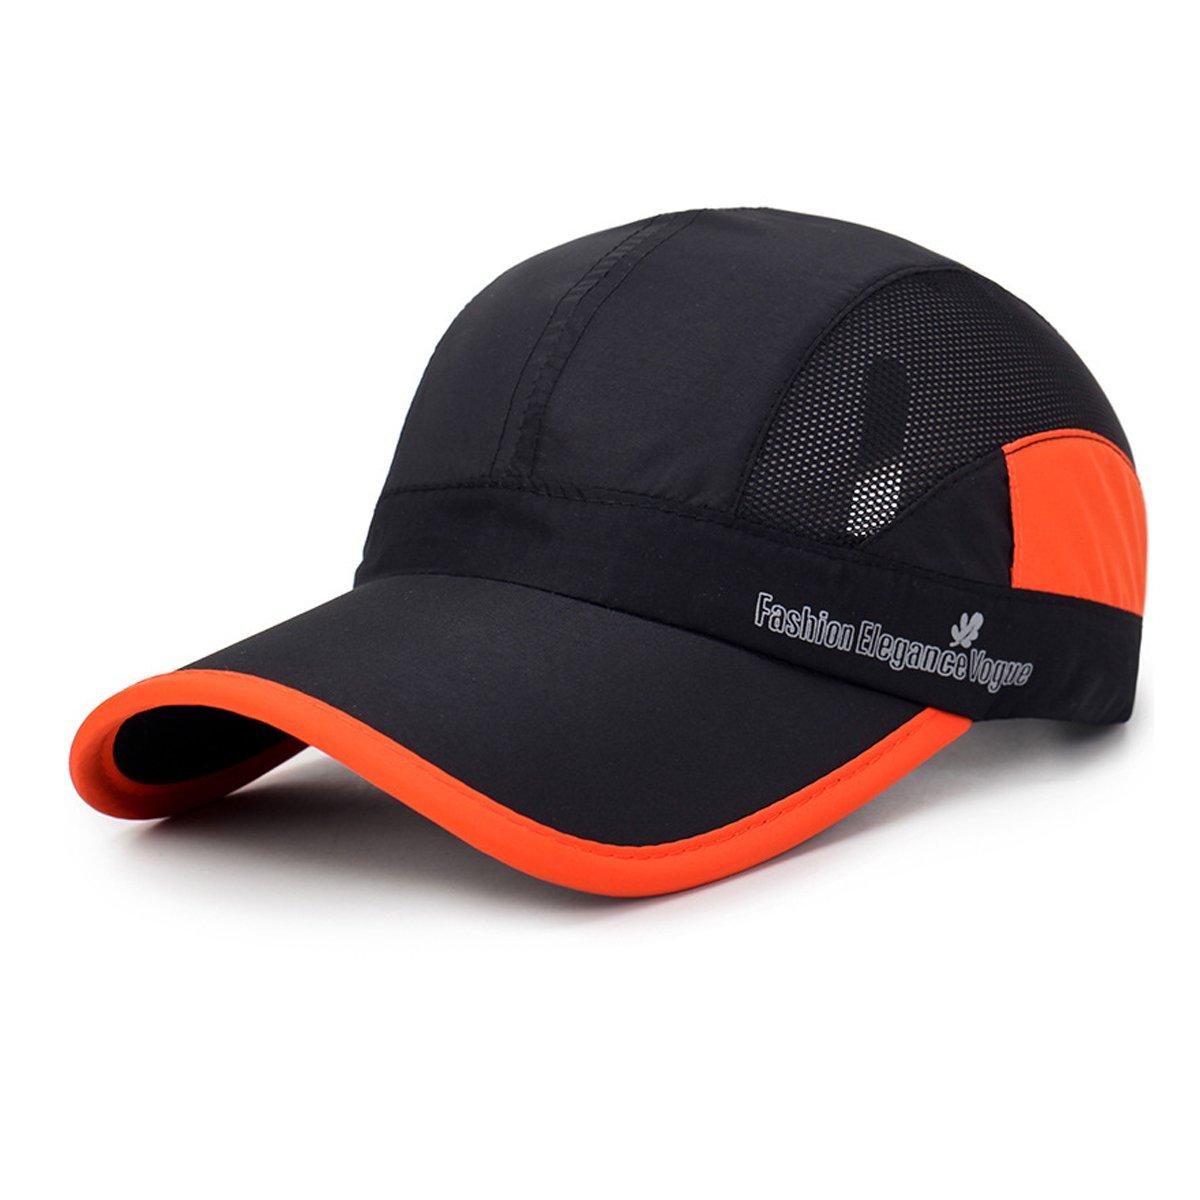 fb4f8e95e07 Amazon.com  Gisdanchz Hat Quick Dry